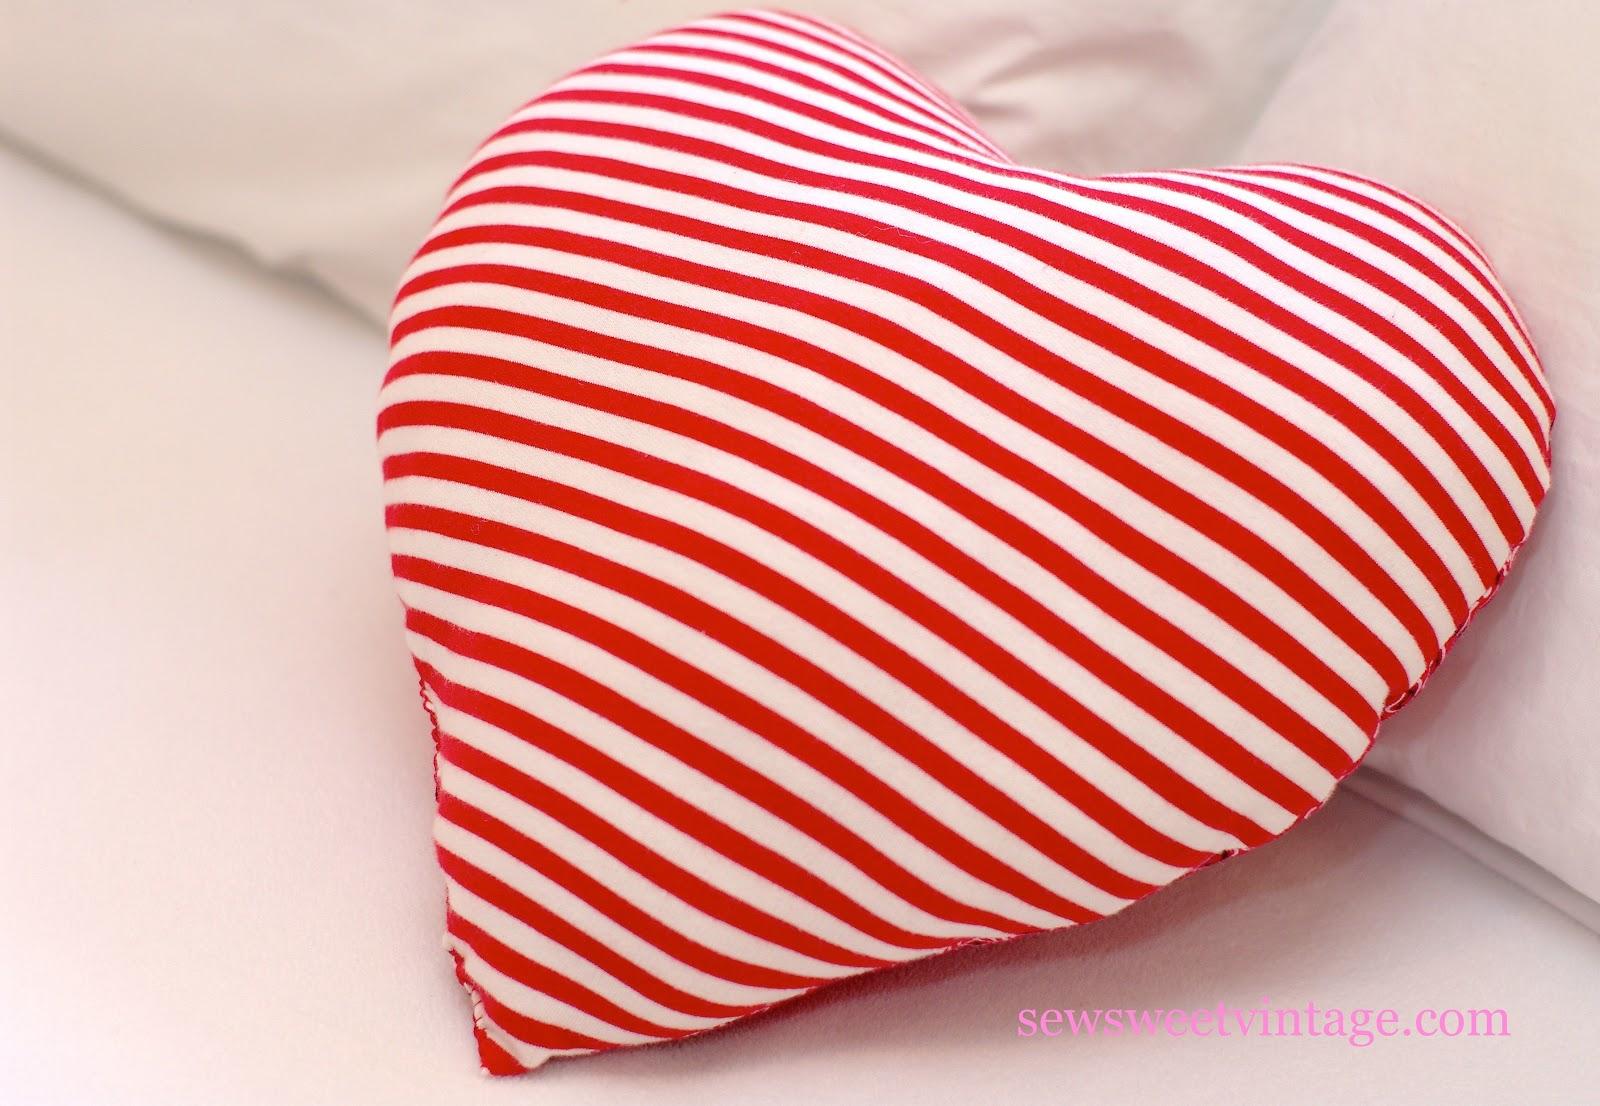 Sew Sweet Vintage Diy Heart Pillow